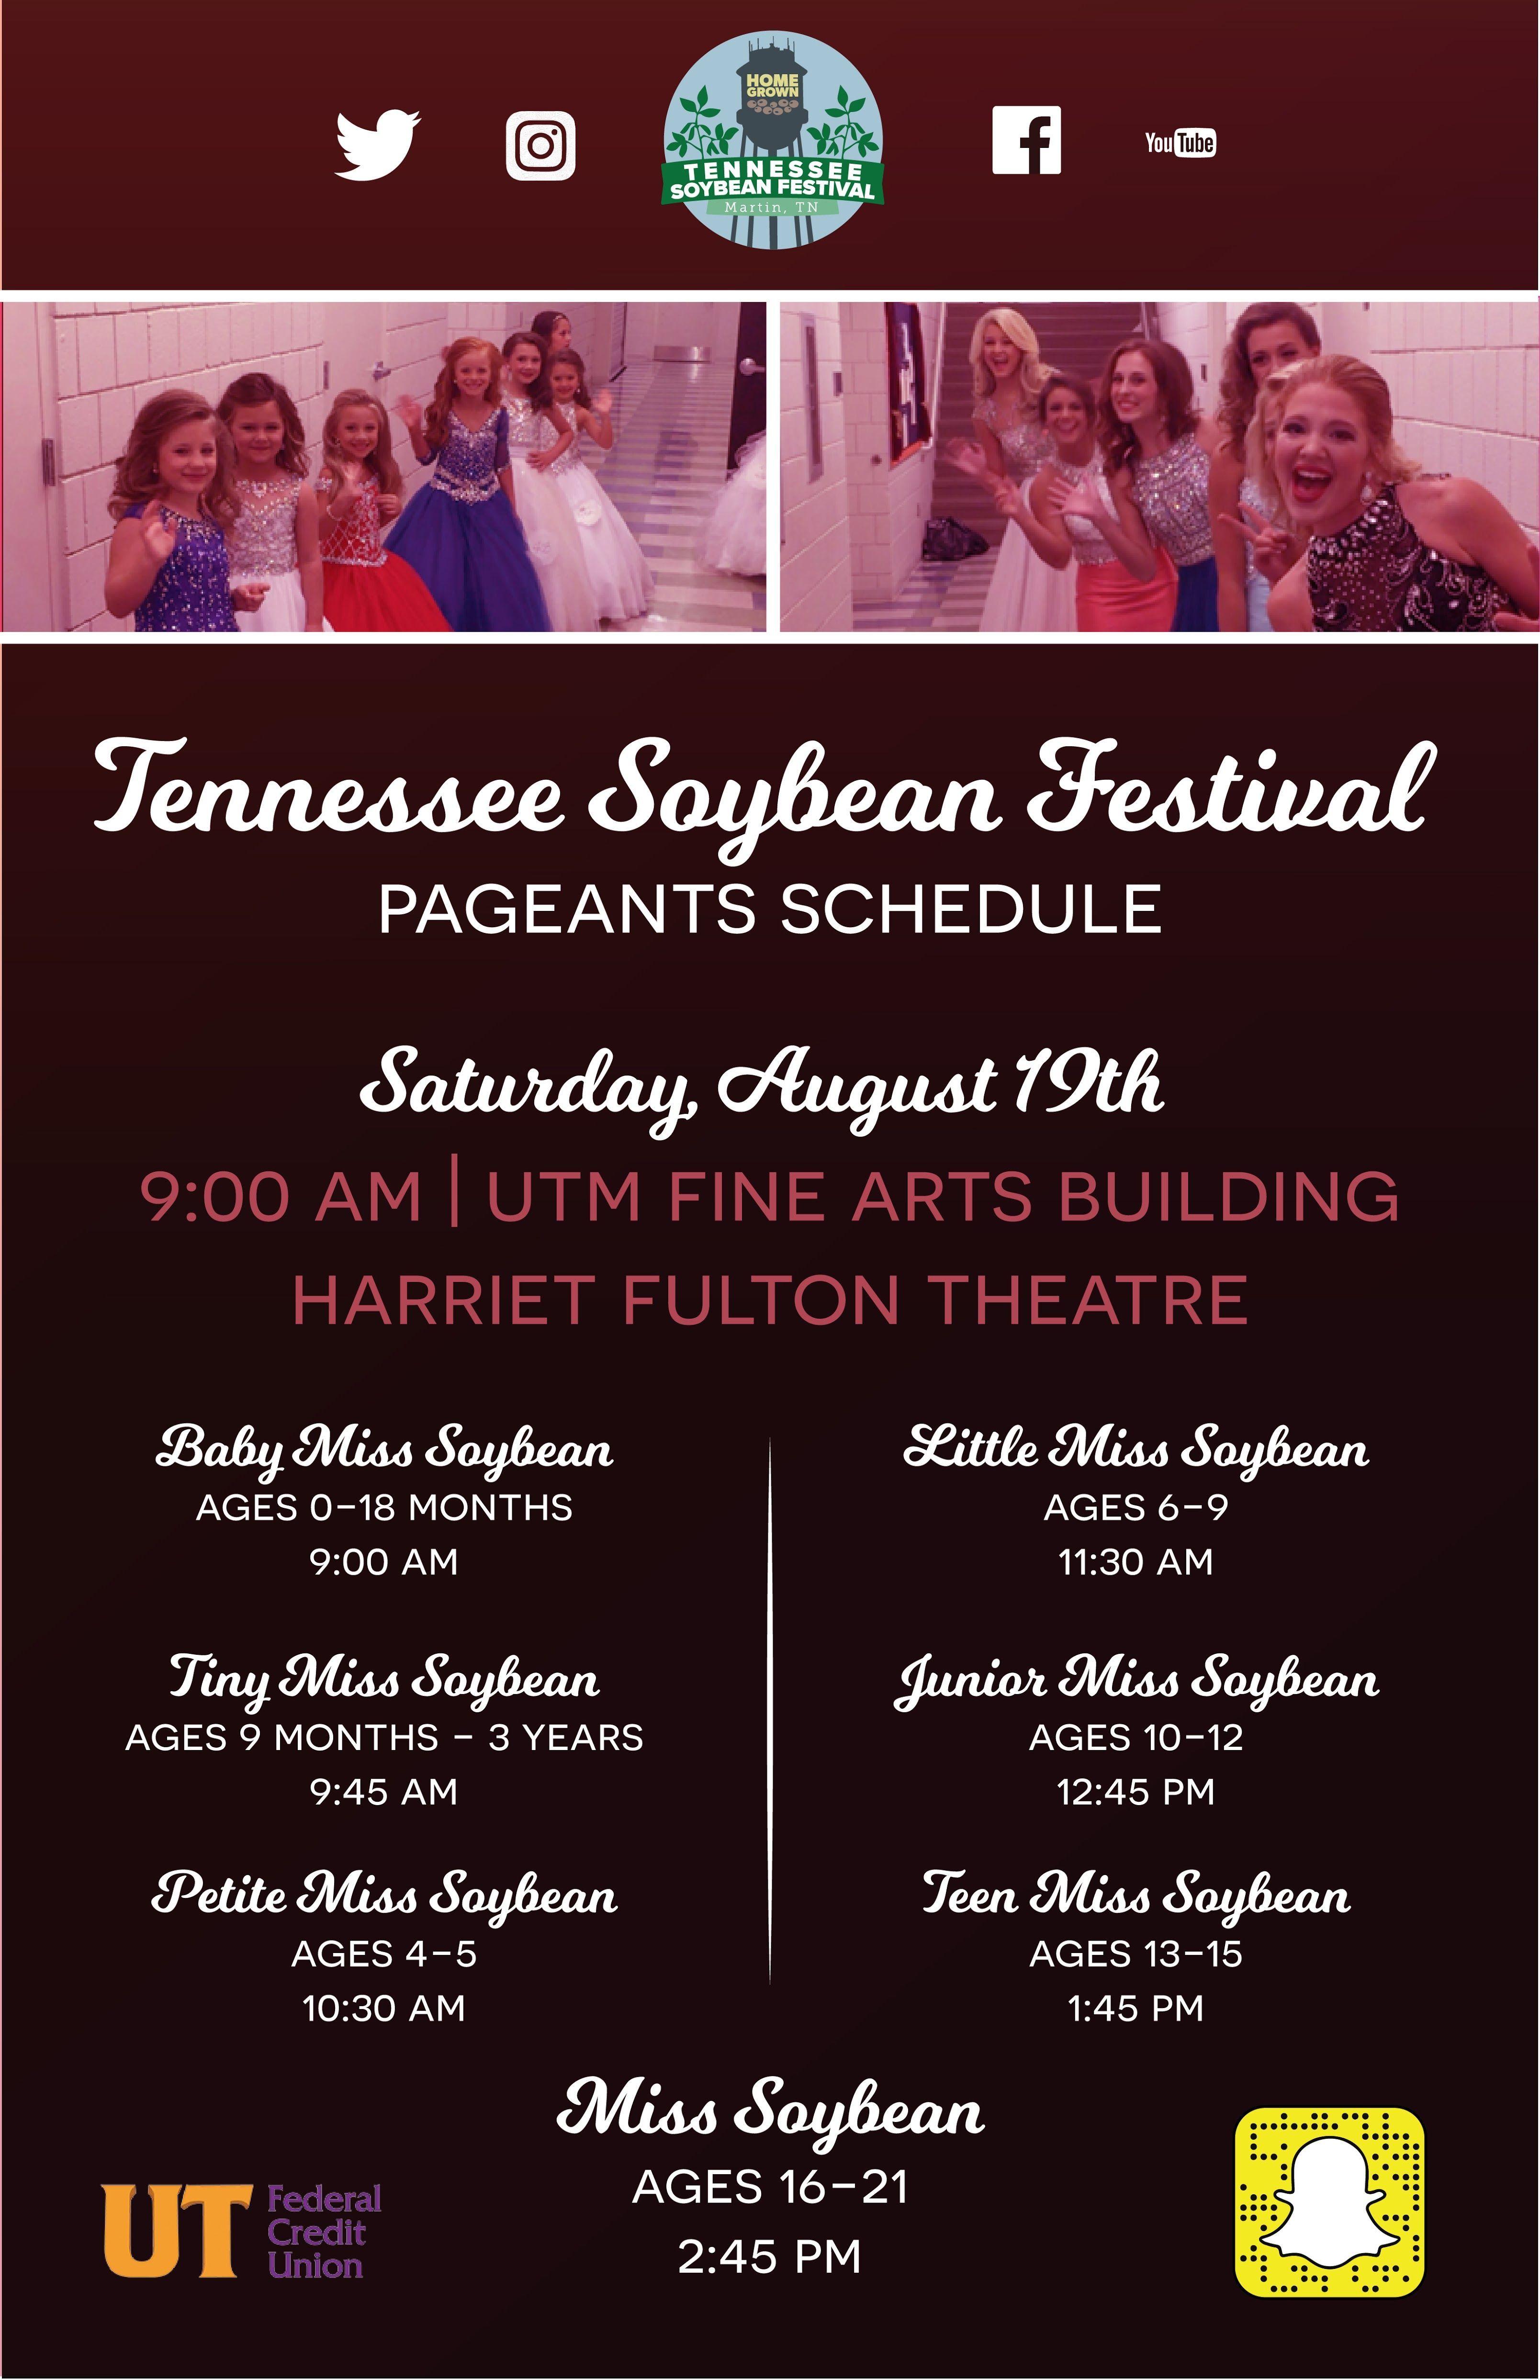 Tennessee Soybean Festival Pageant @ UTM Fine Arts Building, Harriett Fulton Theatre